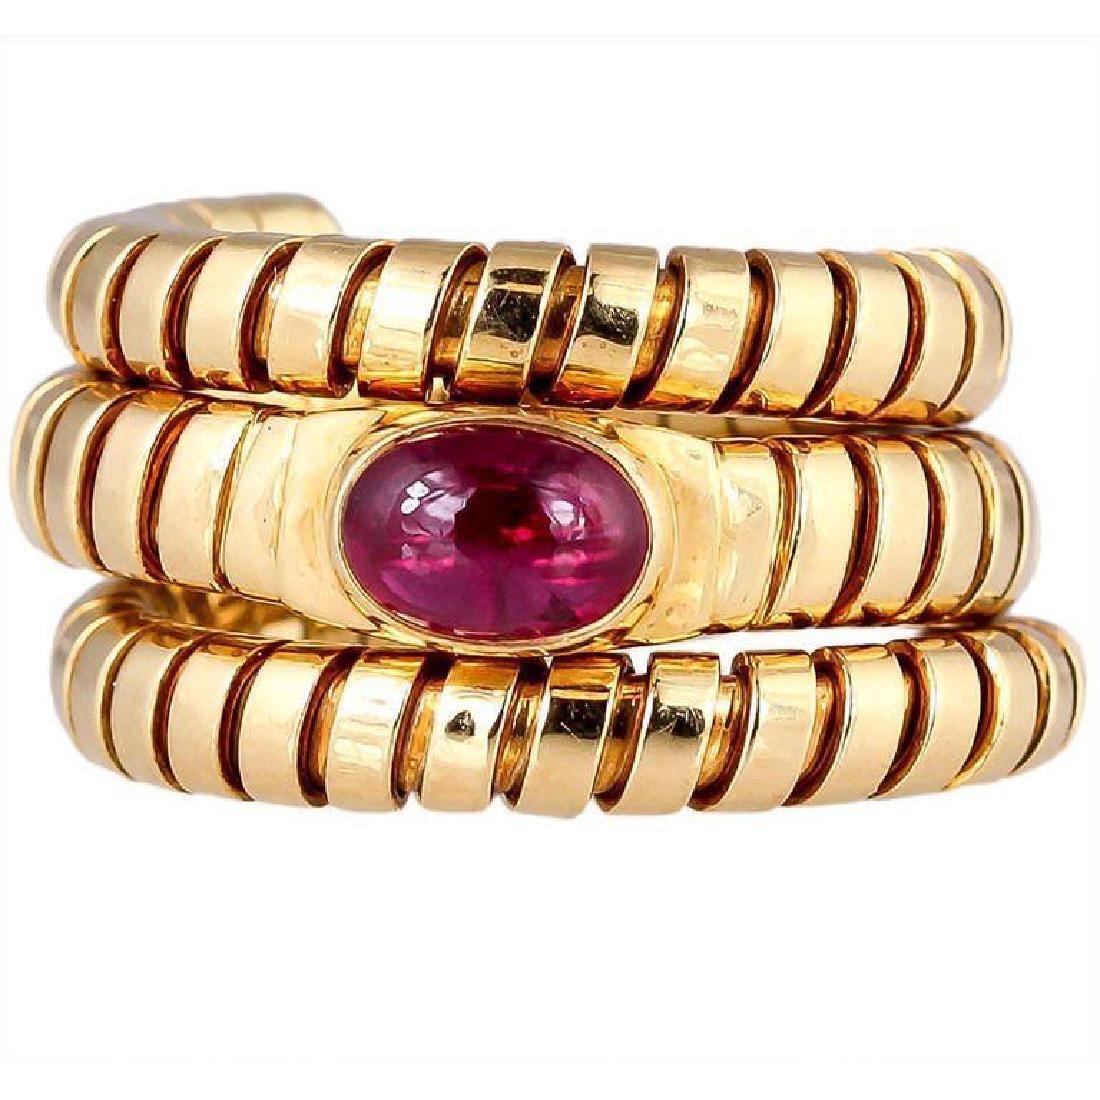 Estate Bulgari Tubogas 18k Gold & Ruby Snake Ring